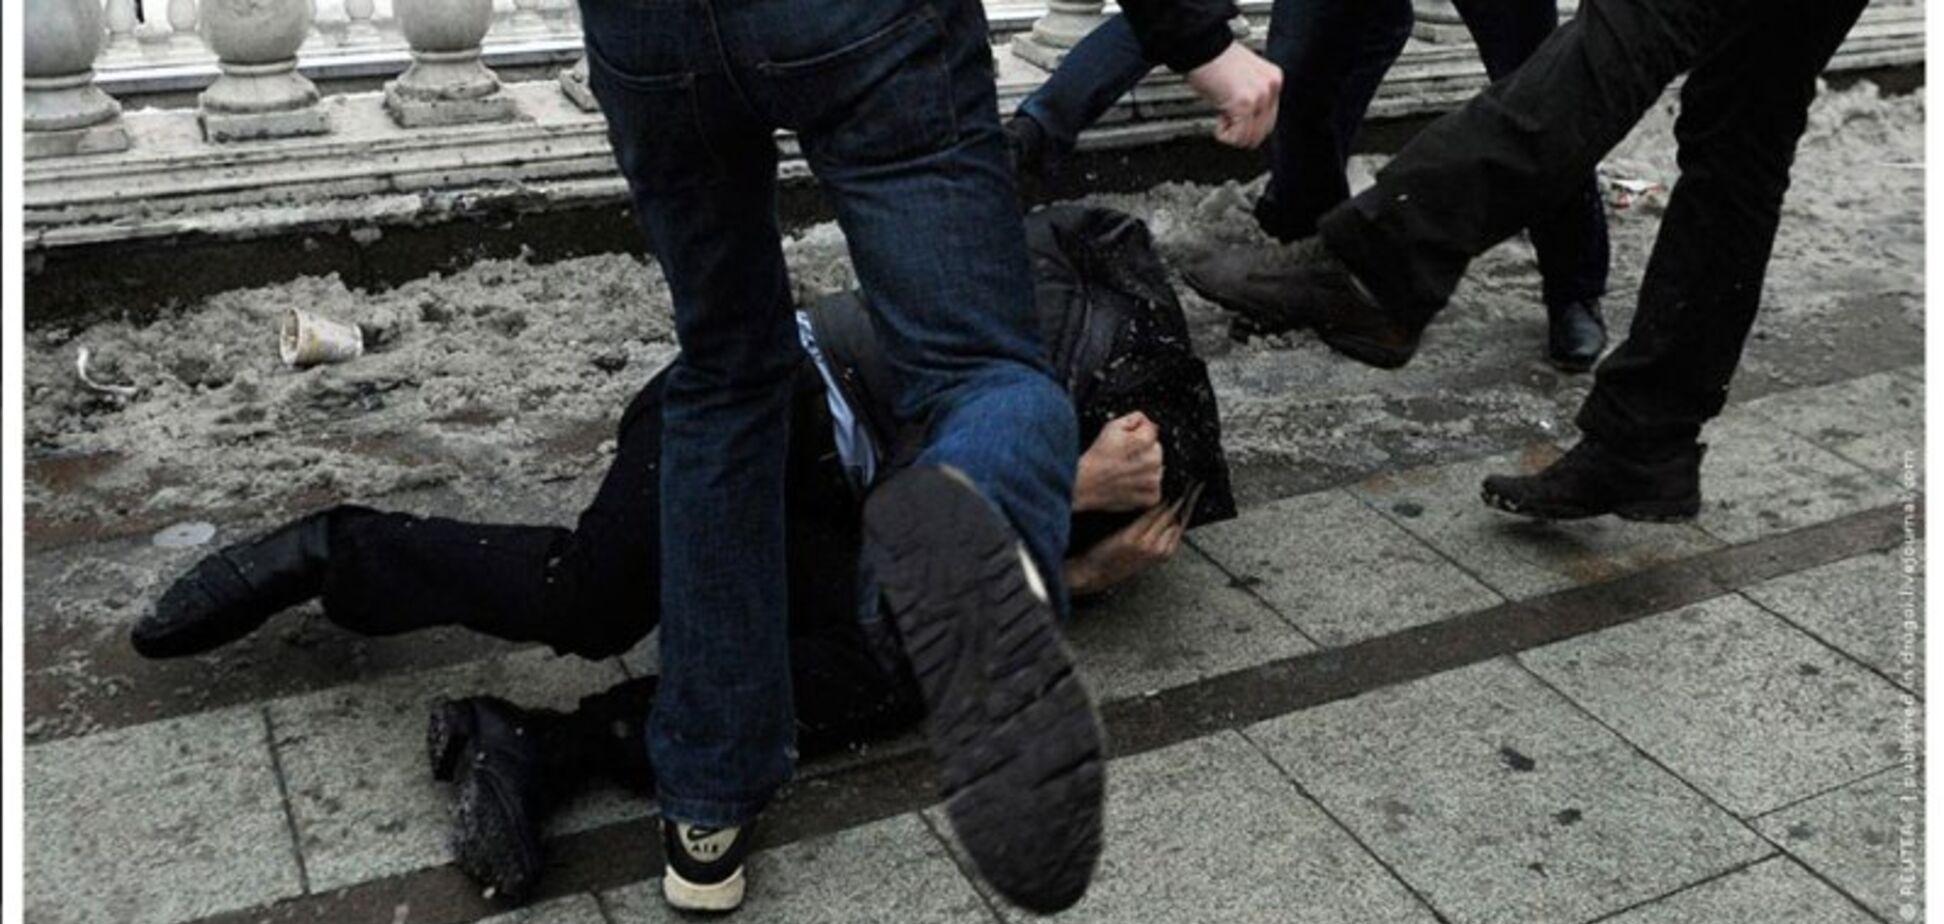 В Днепре охранники жестоко избили мужчину: видео 18+